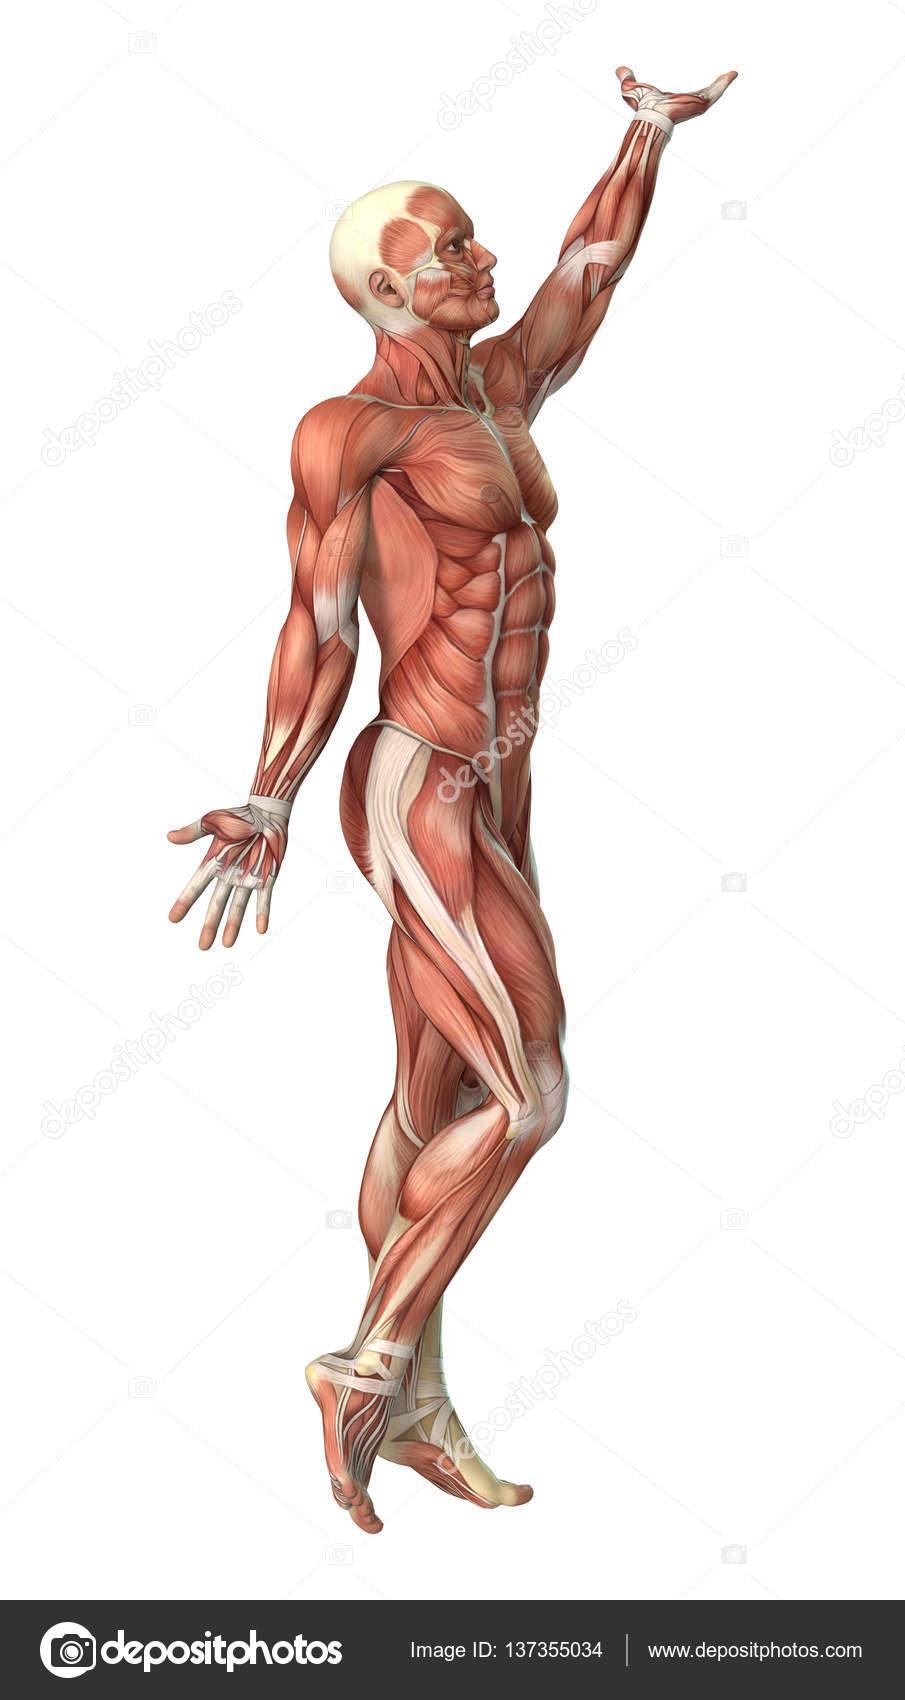 Nett 3d Modell Anatomie Galerie - Anatomie Ideen - finotti.info